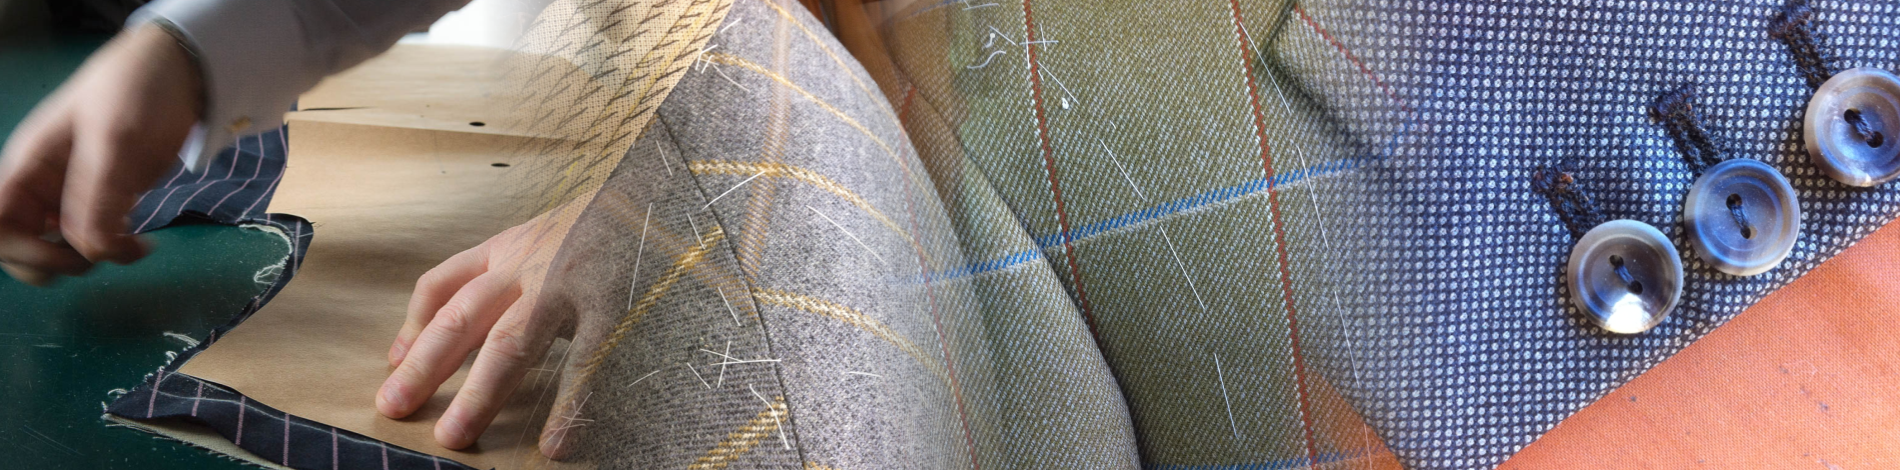 savile row bespoke suits